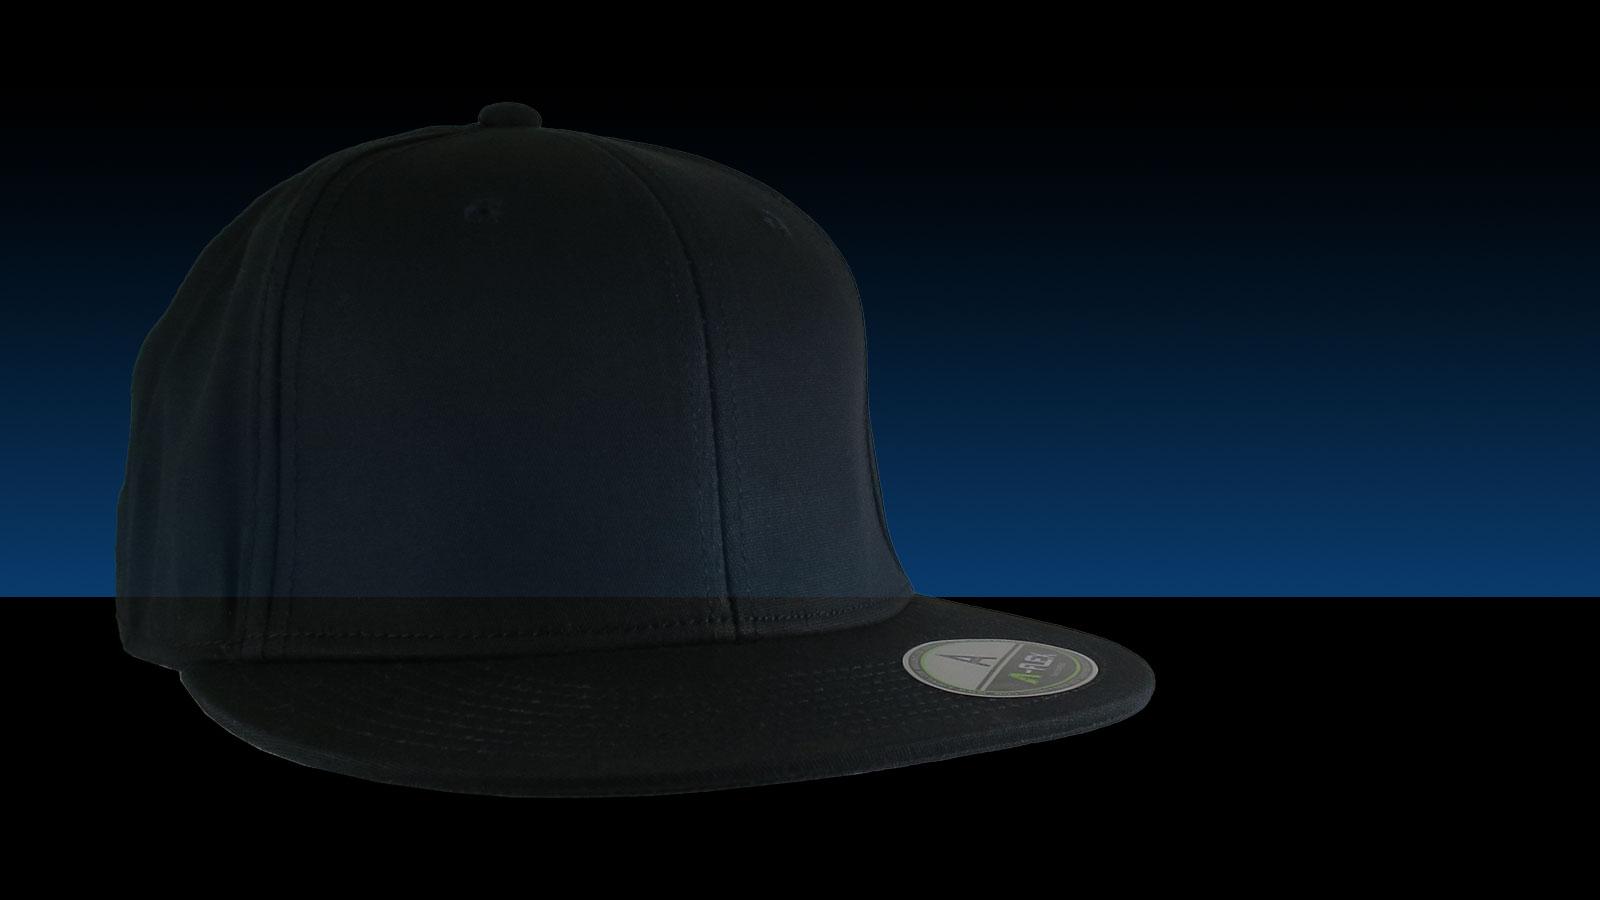 blueshoppe-blue-shoppe-custom-personalized-headwear-baseball-caps-dad-hats-visors-trucker-embroidery-canadian-canada-2022-1